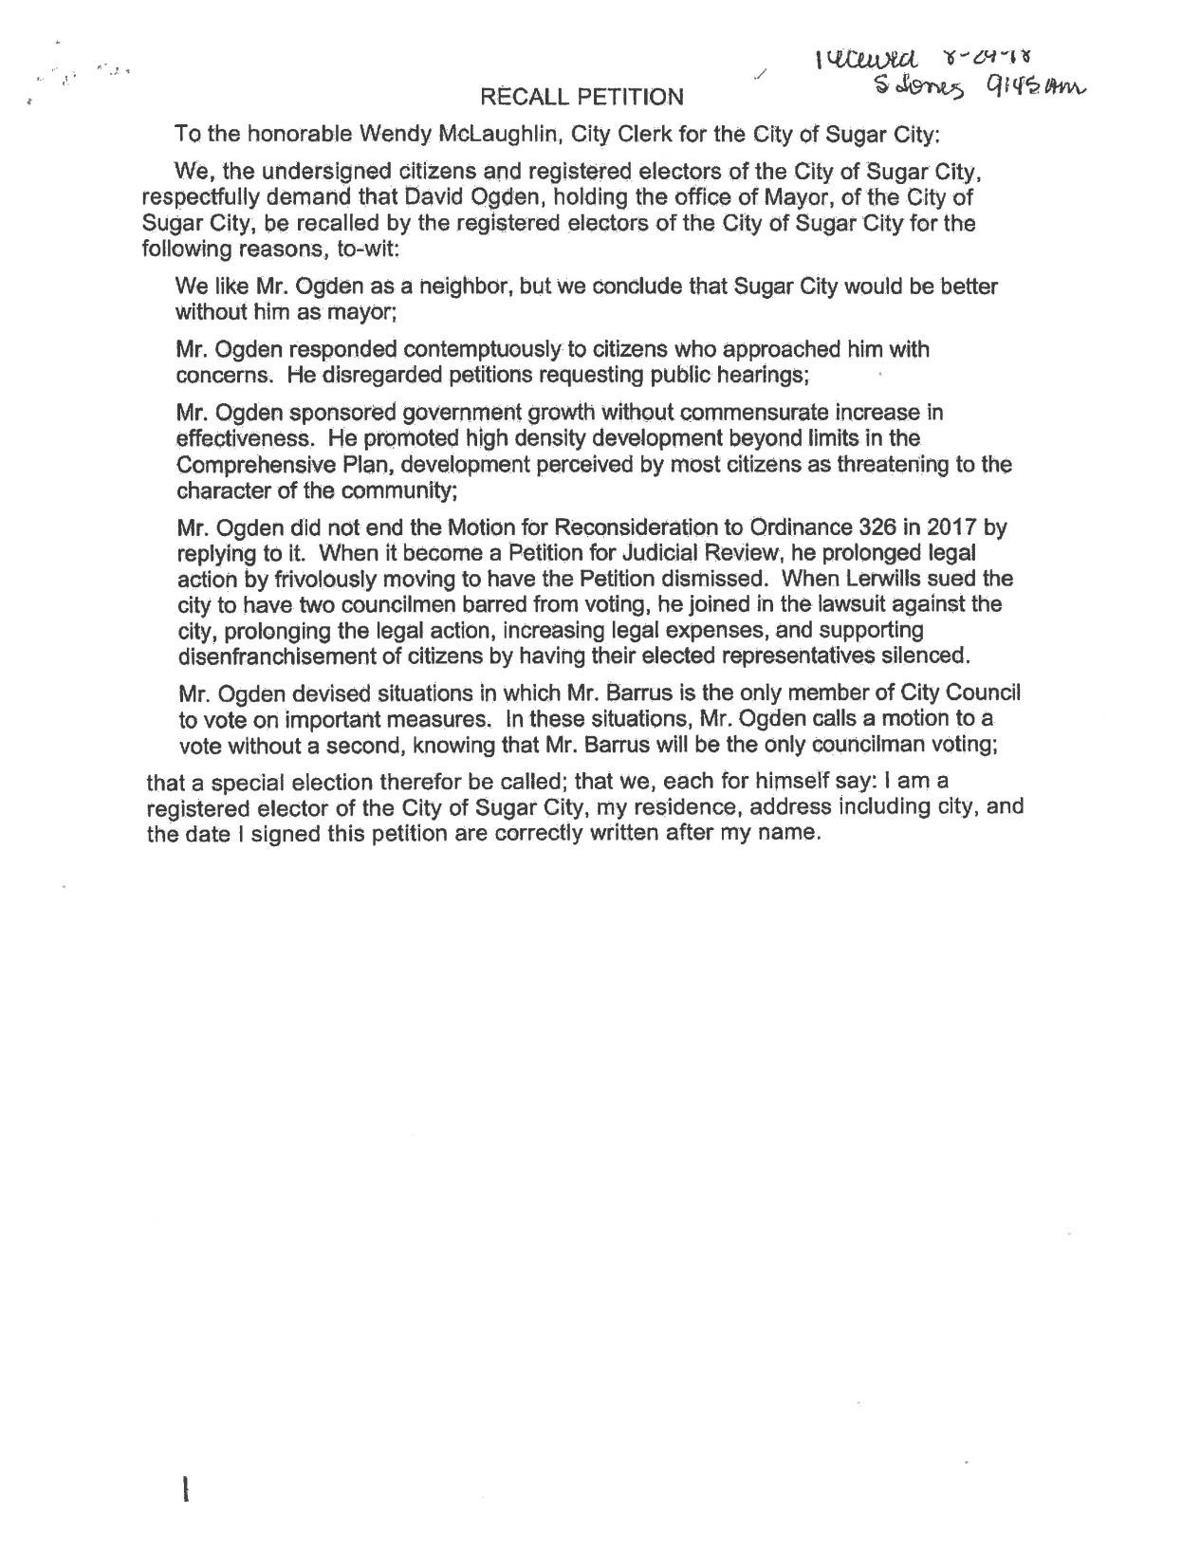 Recall Petition Mayor Ogden 1